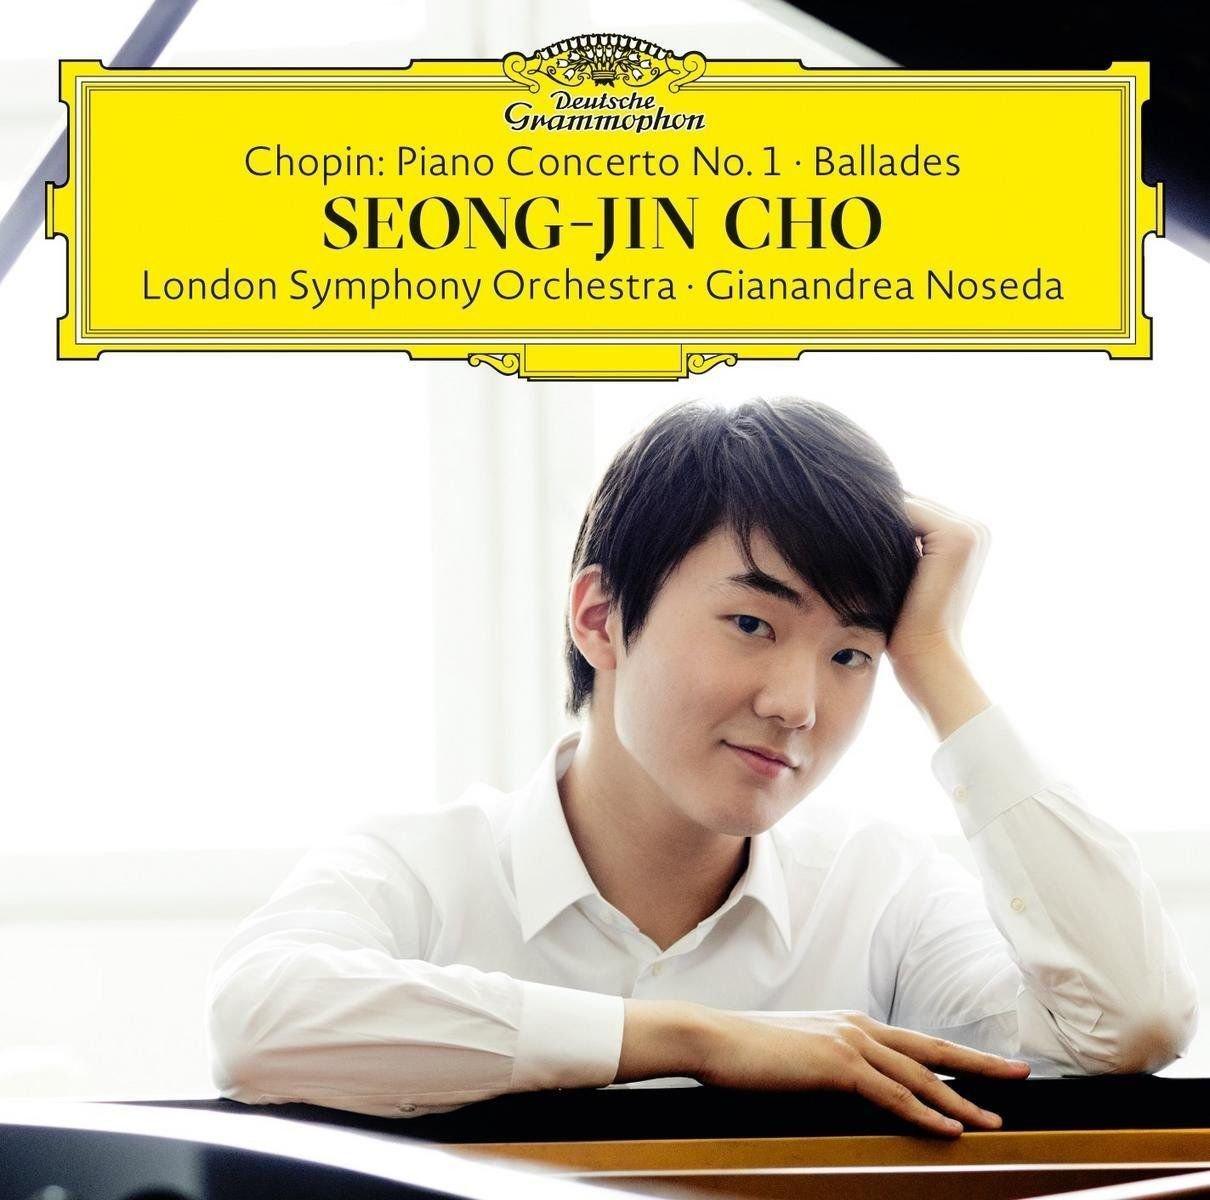 Chopin:Piano Concerto No.1; Ballades by Seong-Jin Cho [Audio CD] [Frederic Chop]